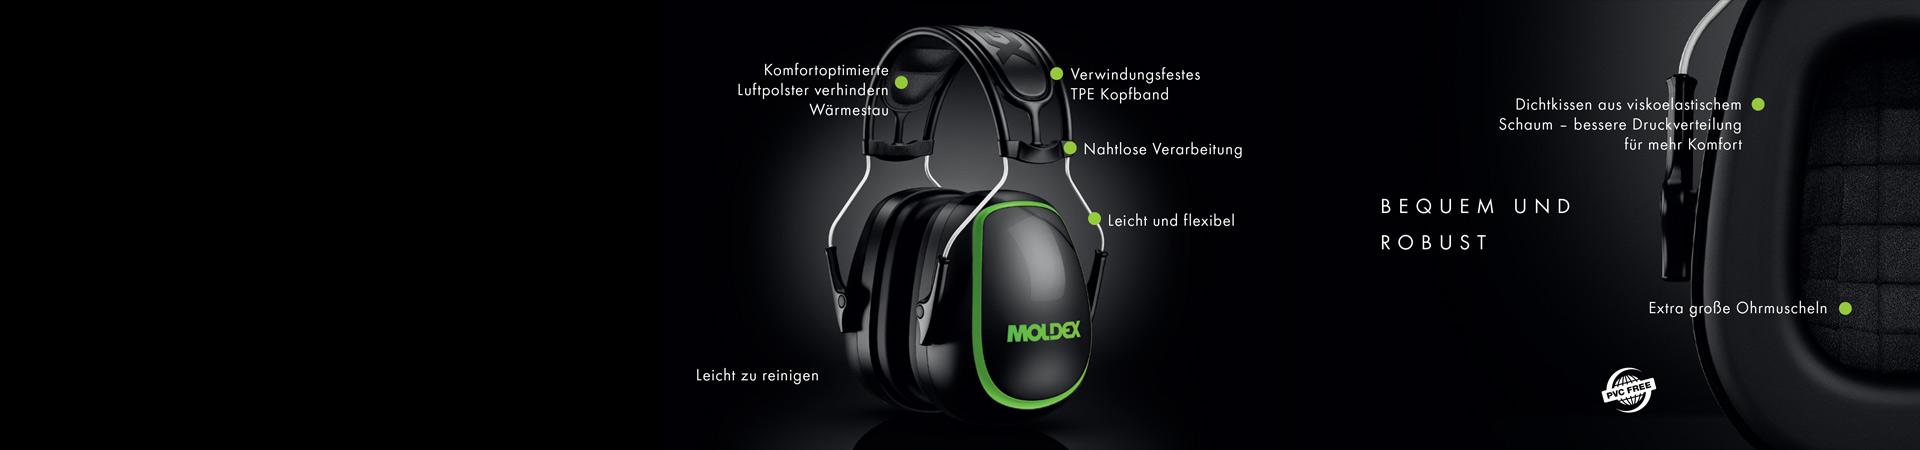 M5 Bügel Moldex